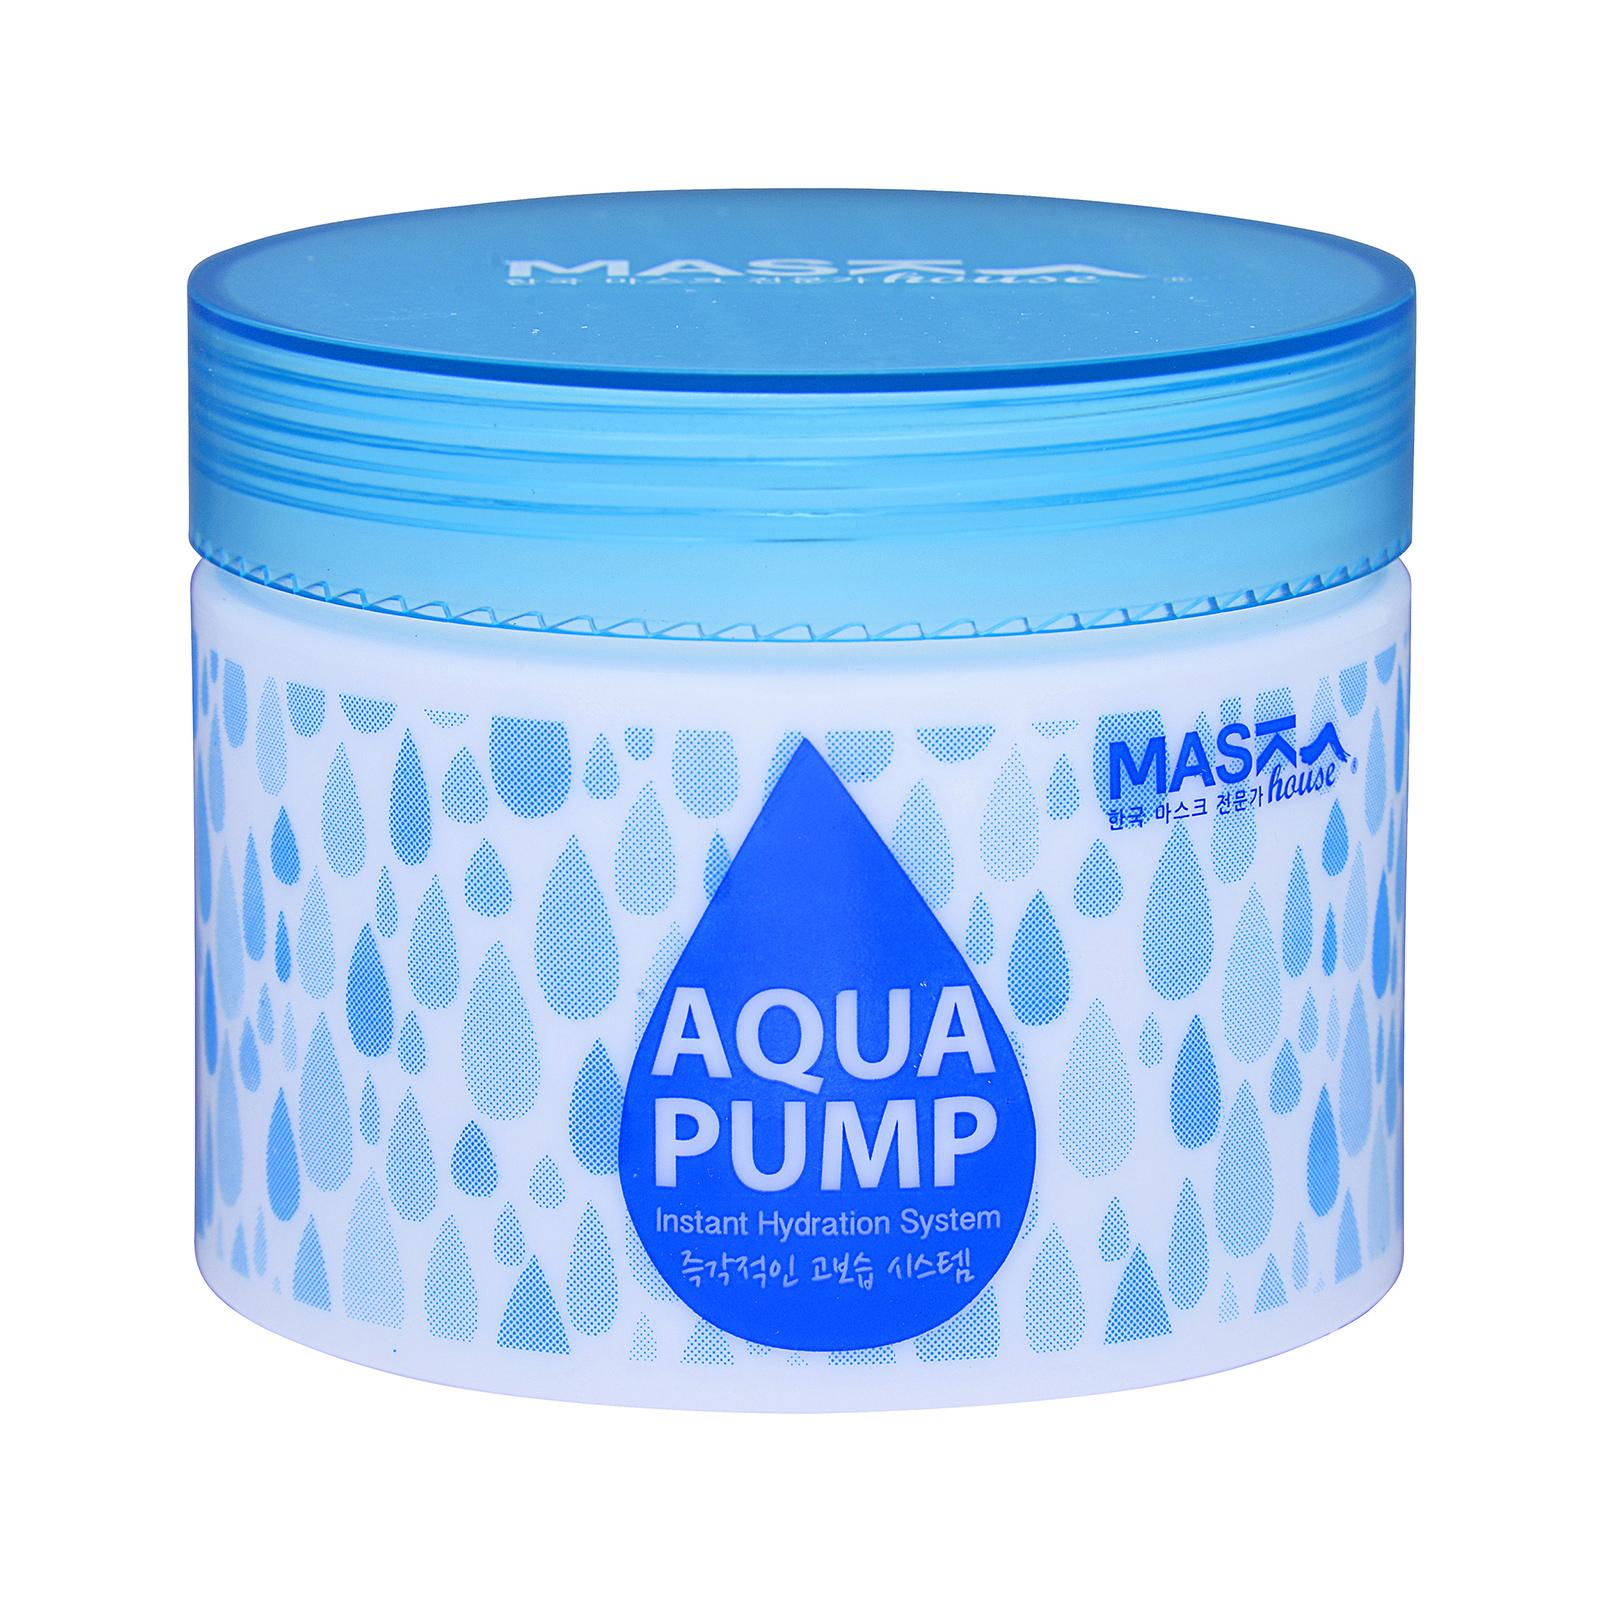 Mask House Aqua Pump Instant Hydration System 100ml,